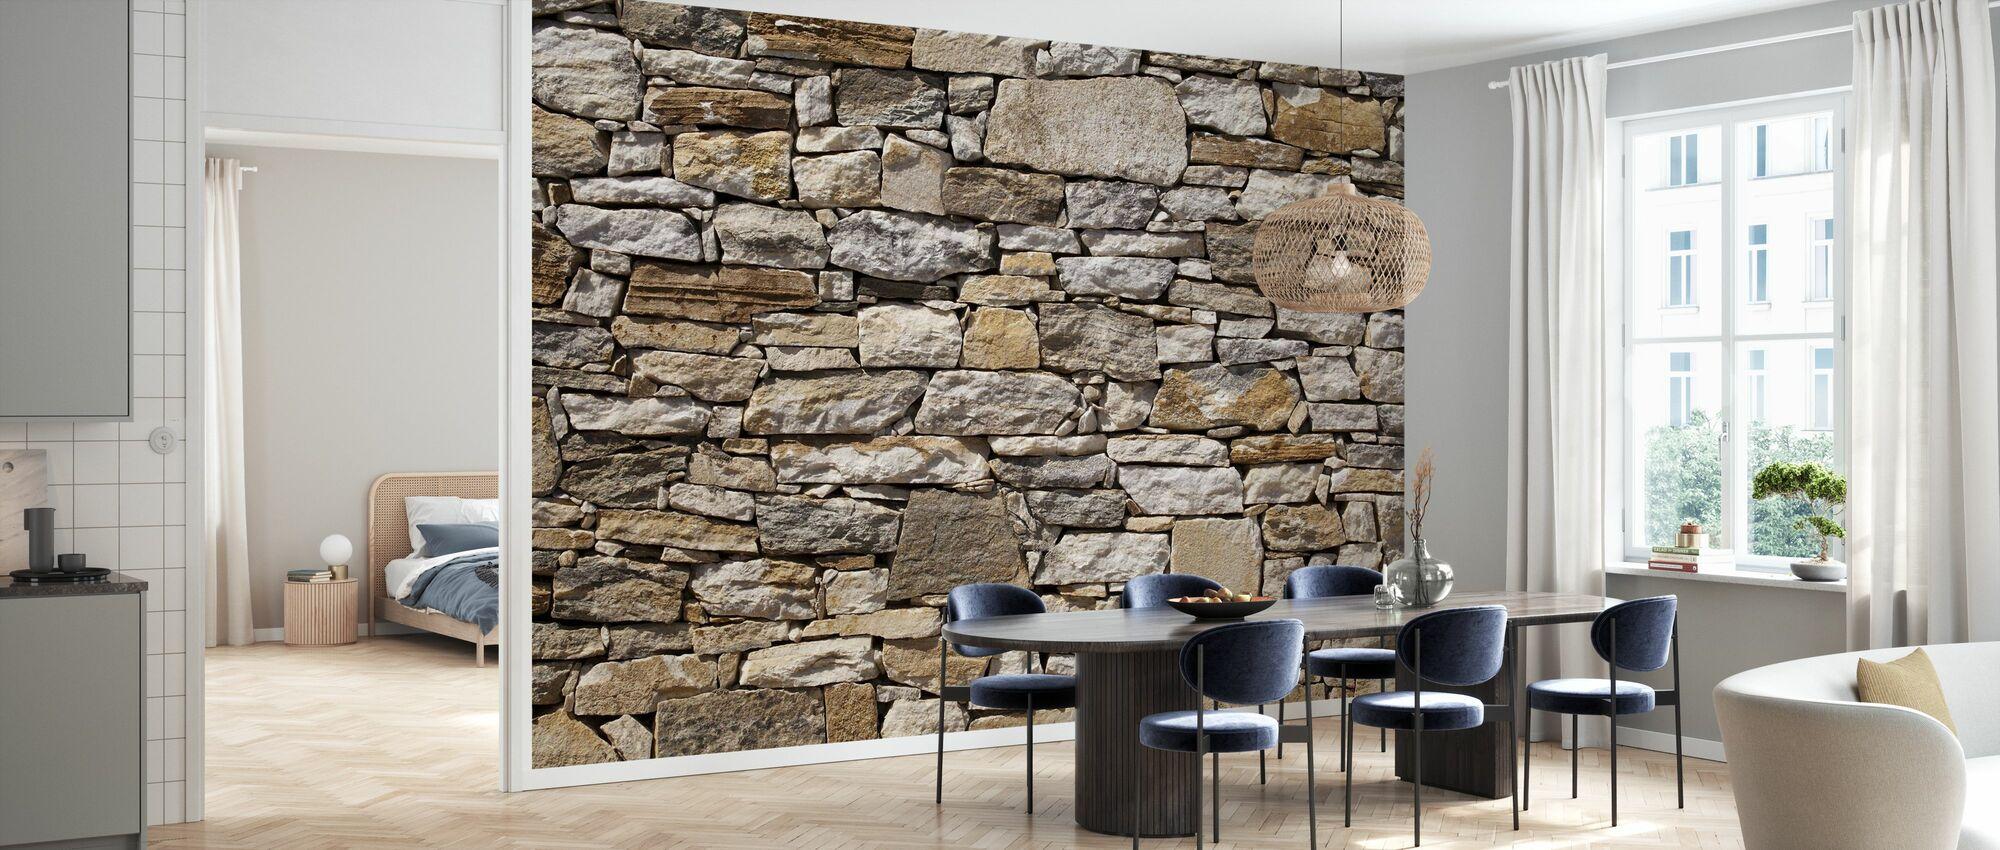 Stenen muur achtergrond - Behang - Keuken